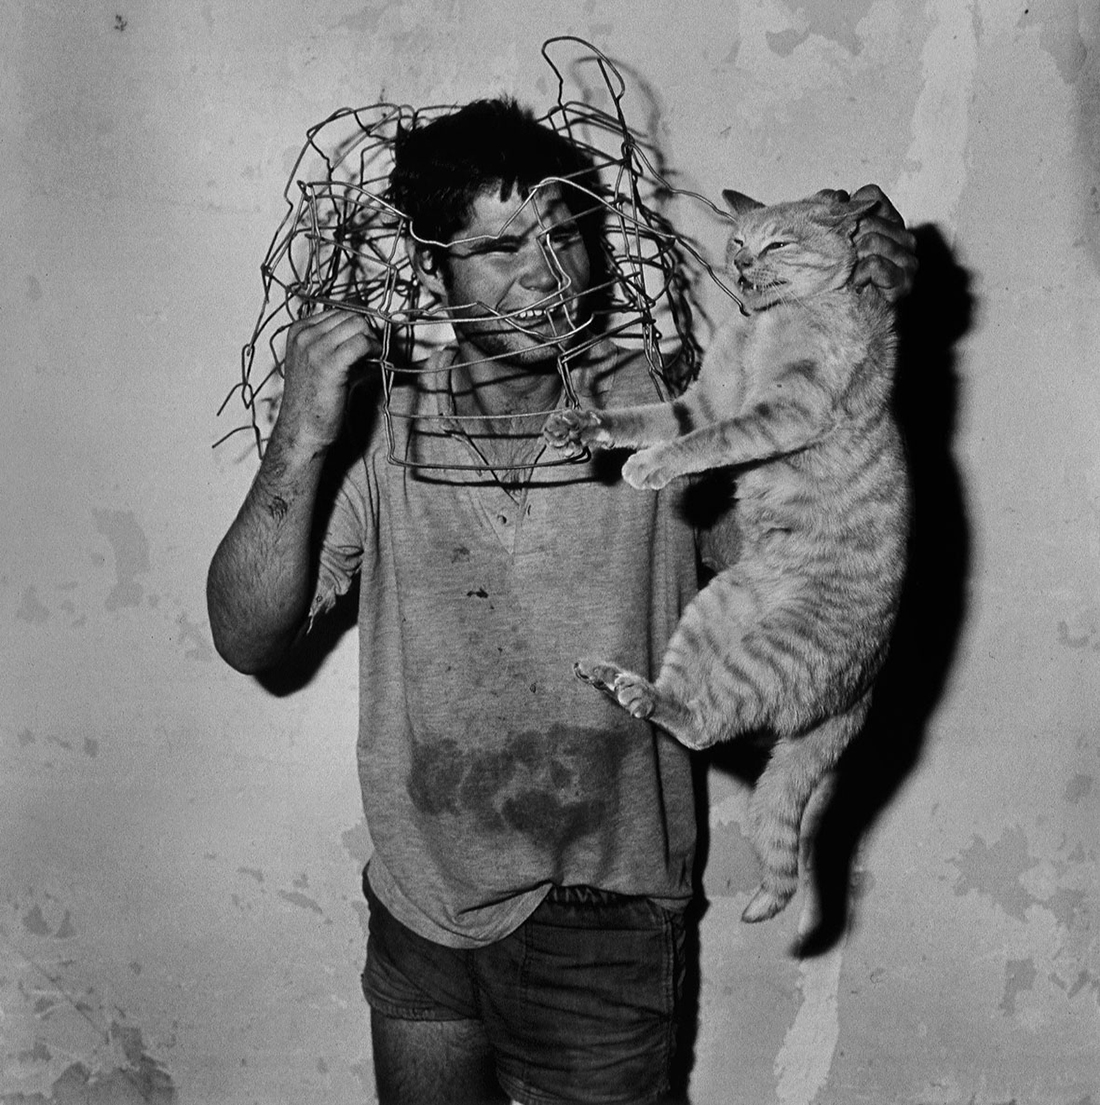 Cat catcher, 1998, Roger Ballen